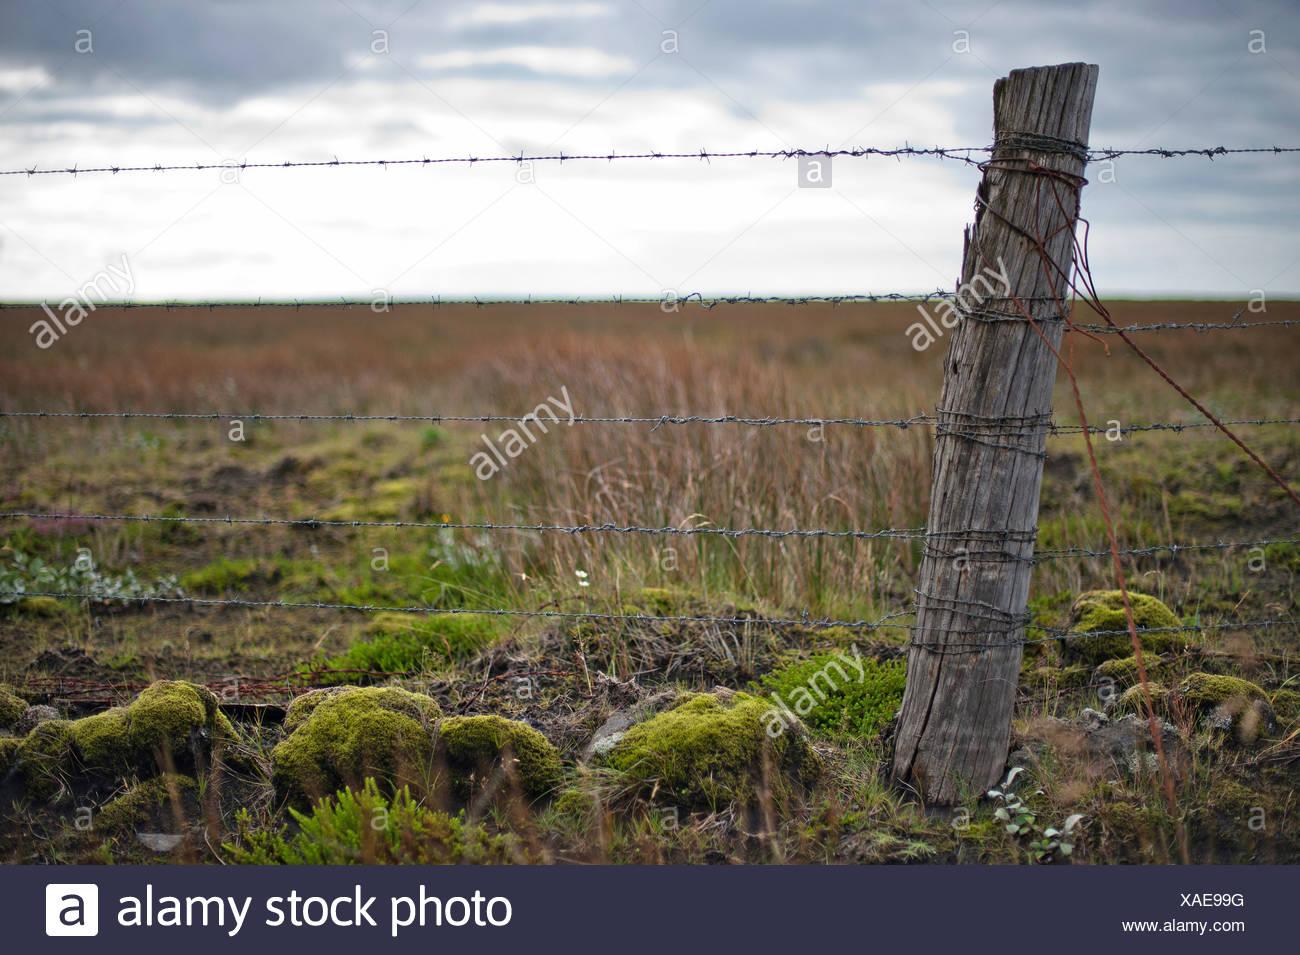 Wooden post and barbed wire, fence near Kirkjubæjarklaustur, Kirkjubaejarklaustur, Skaftárhreppur, Suðurland, Sudurland, Iceland - Stock Image